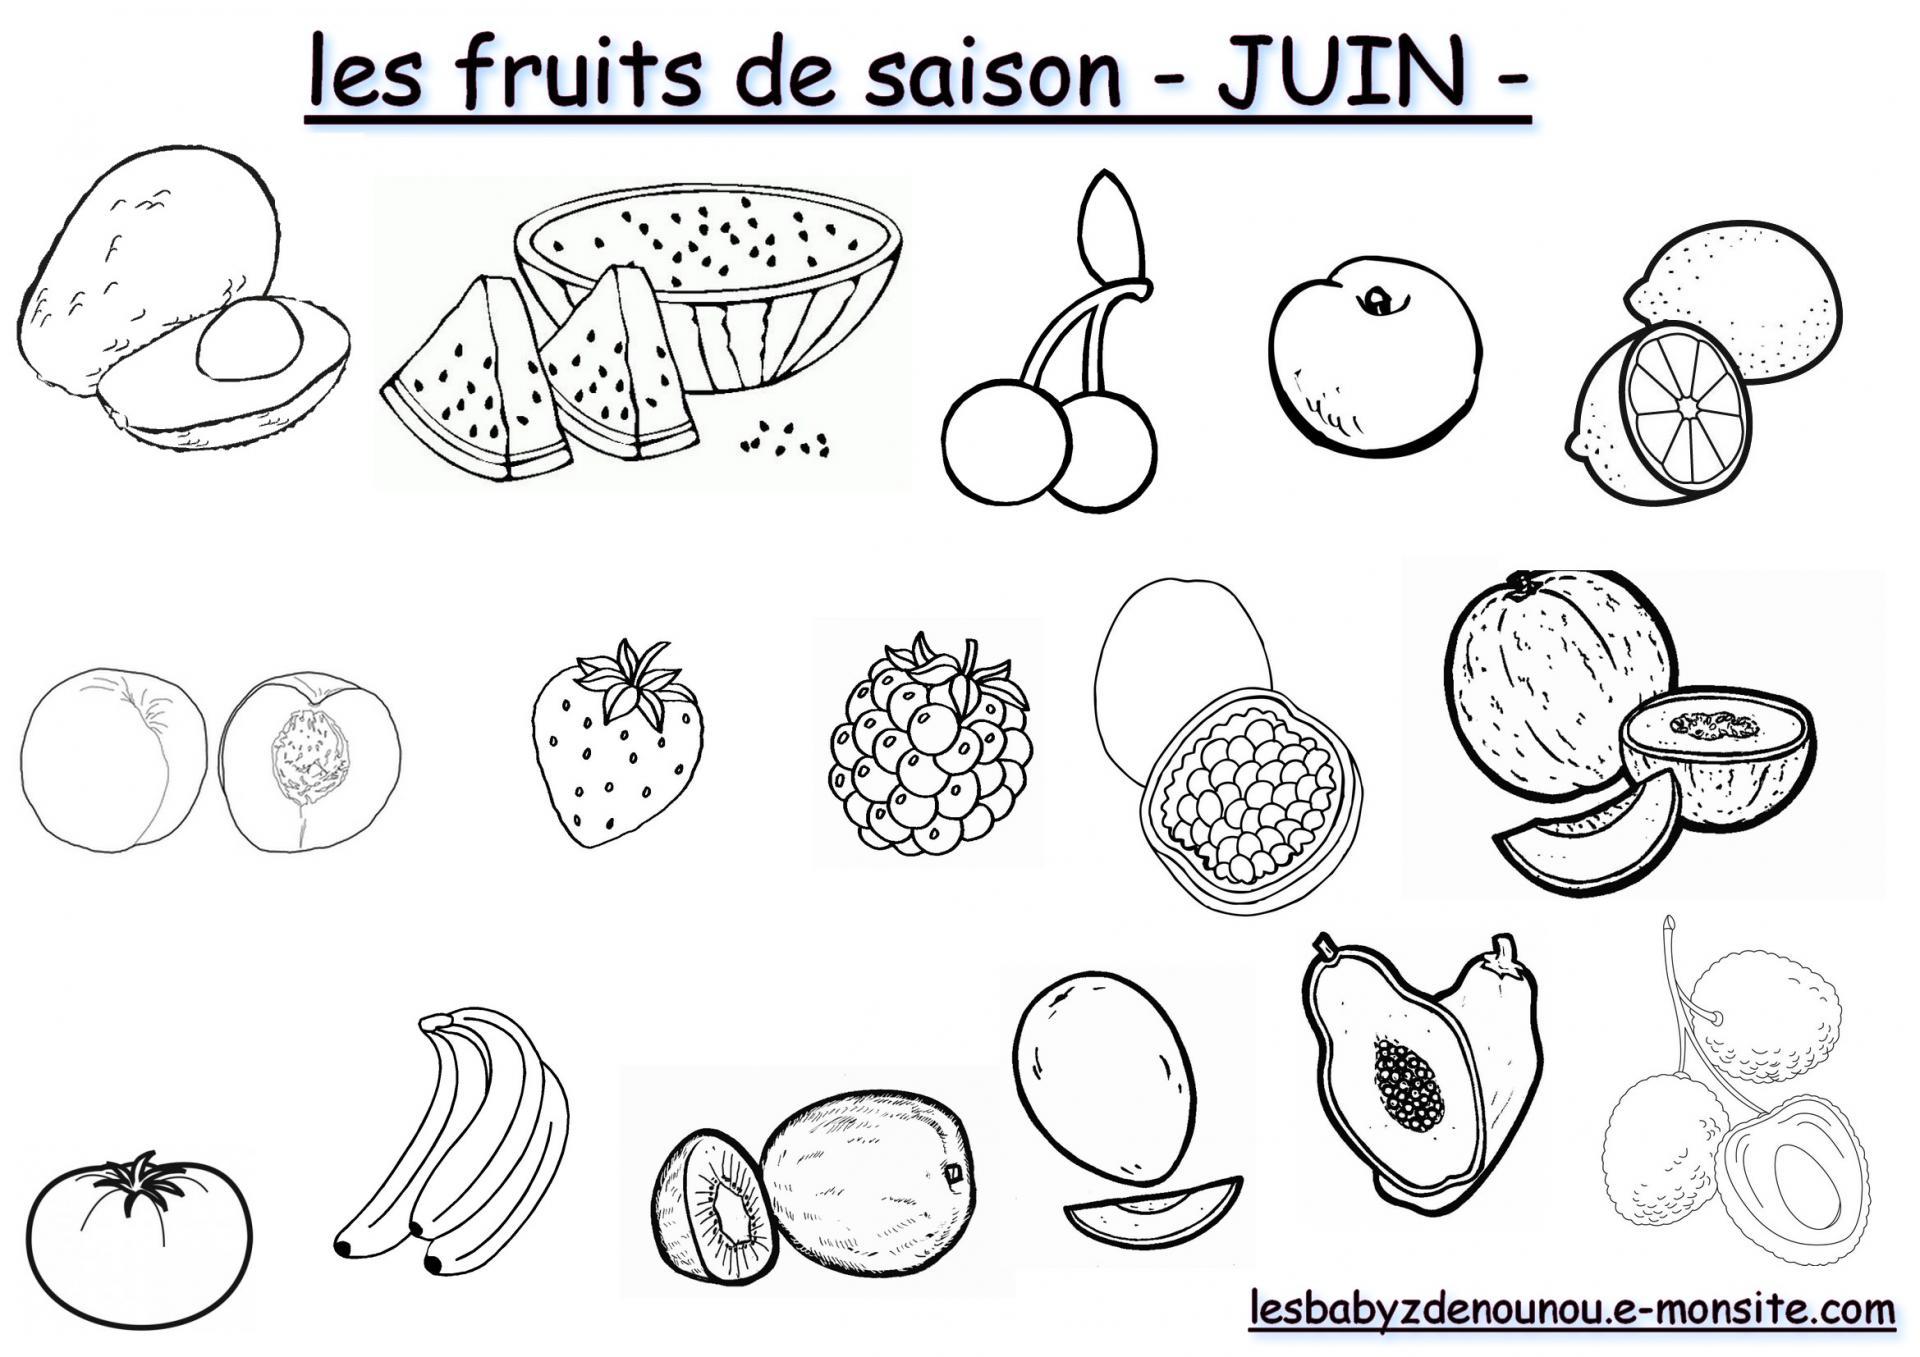 Les fruits juin